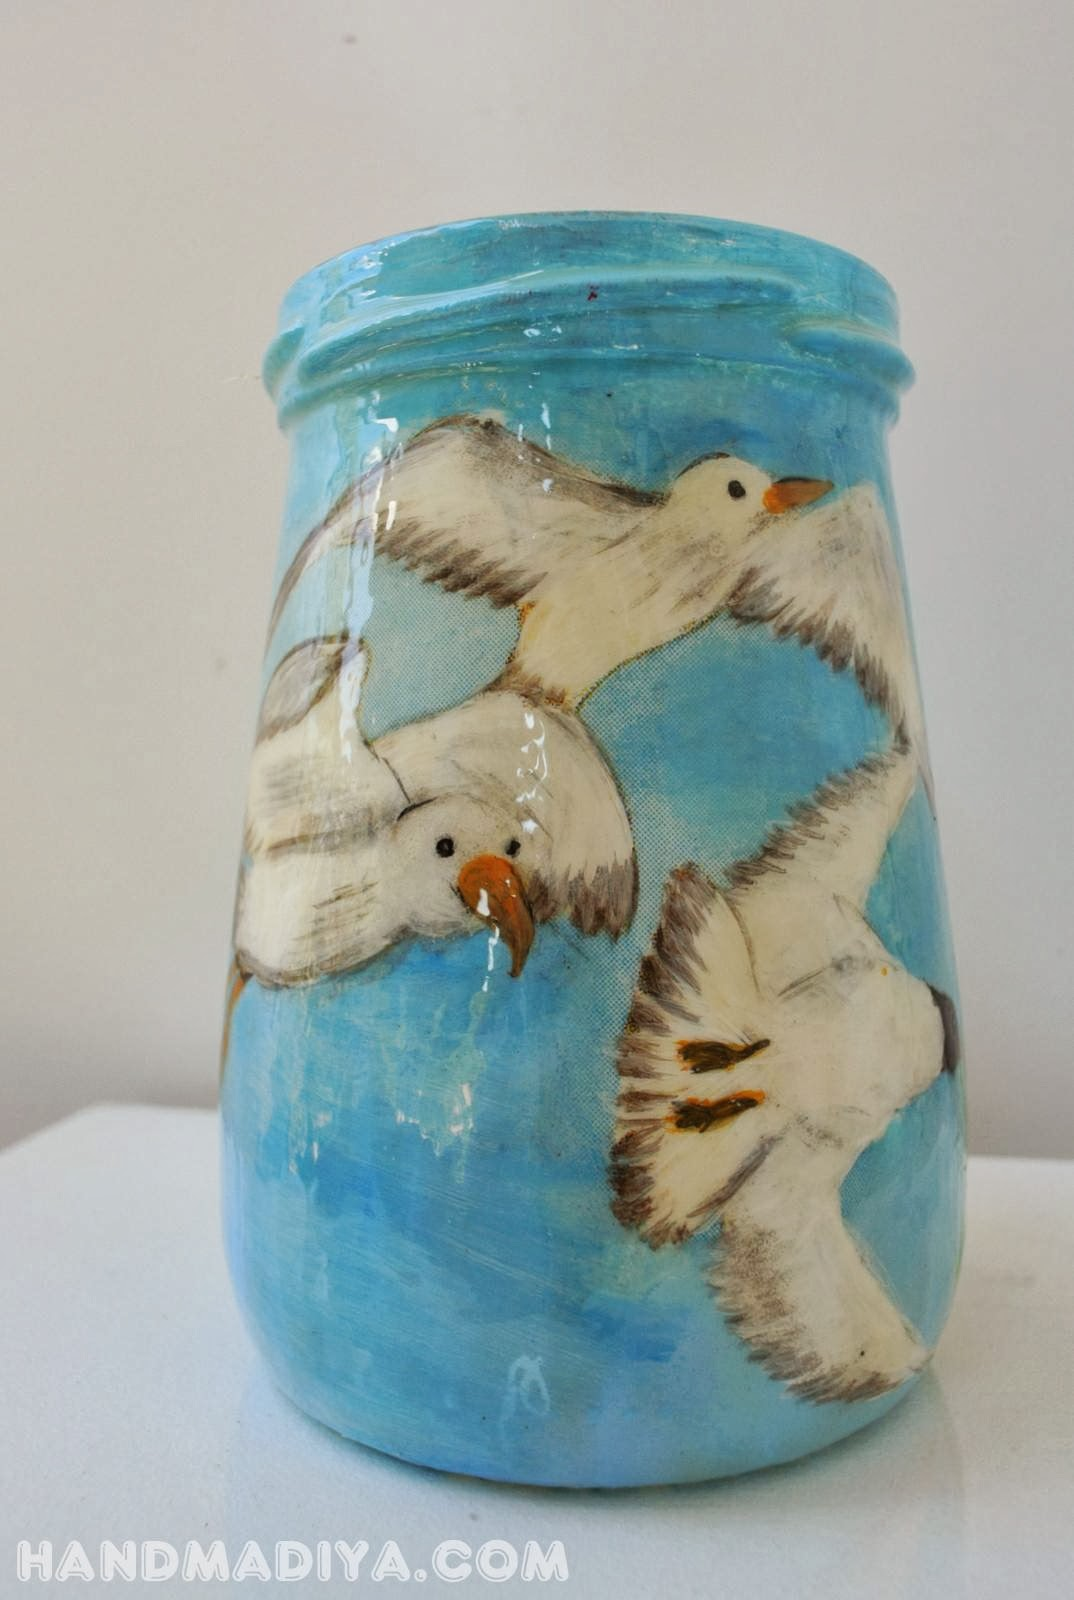 Декупаж стеклянной банки. Мастер-класс. Decoupage glass jar. DIY step-by-step tutorials